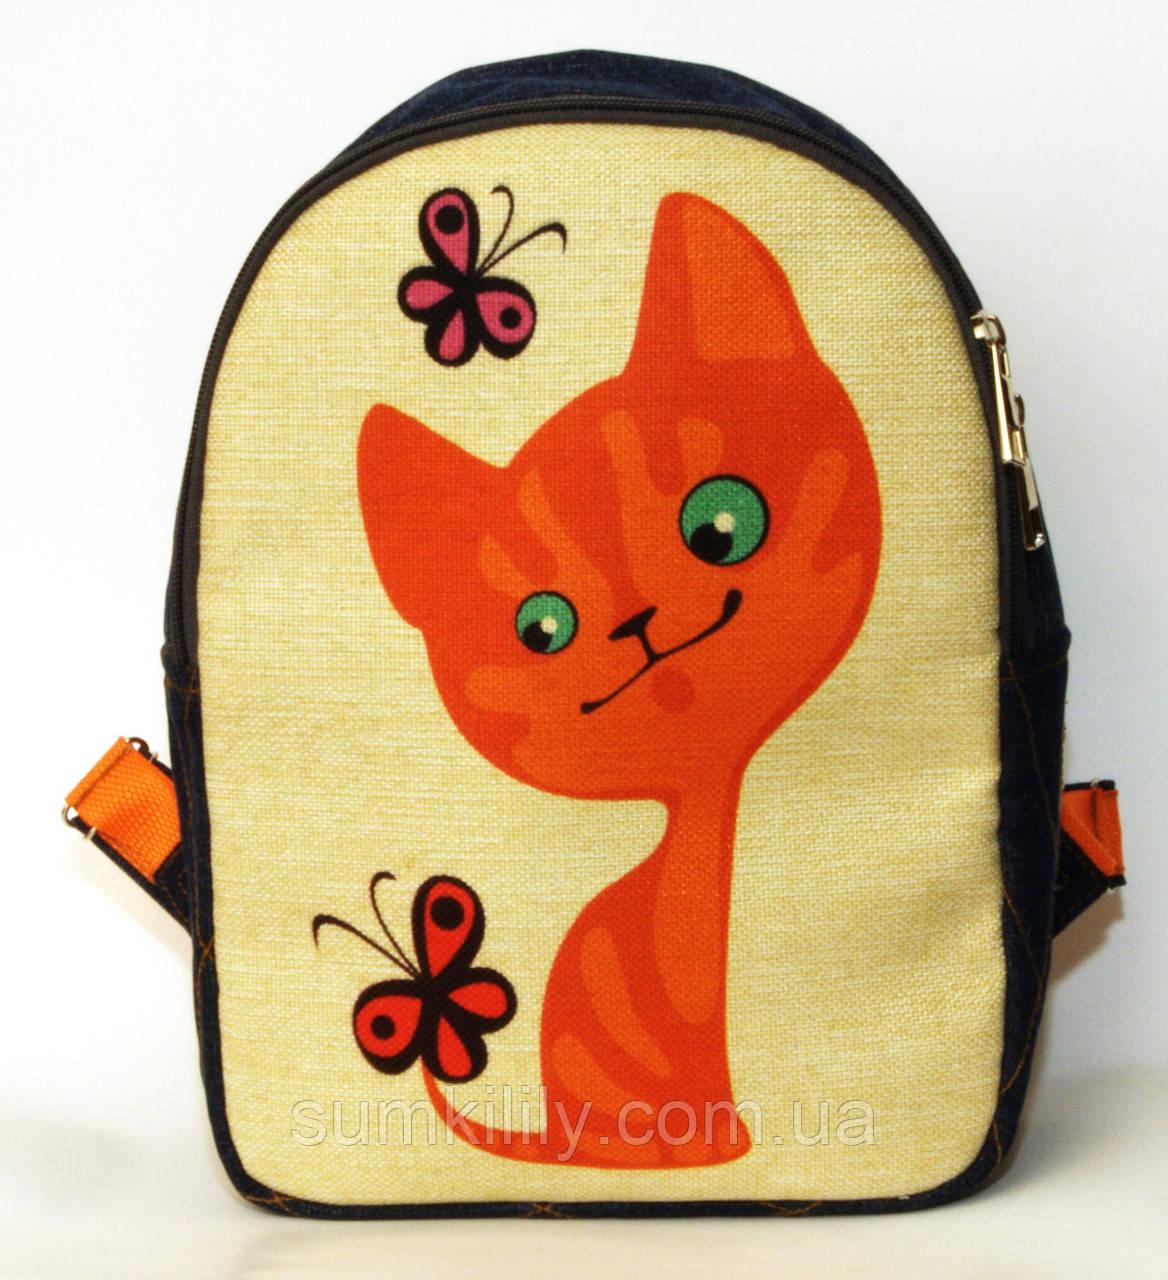 Дитячий рюкзак кошеня